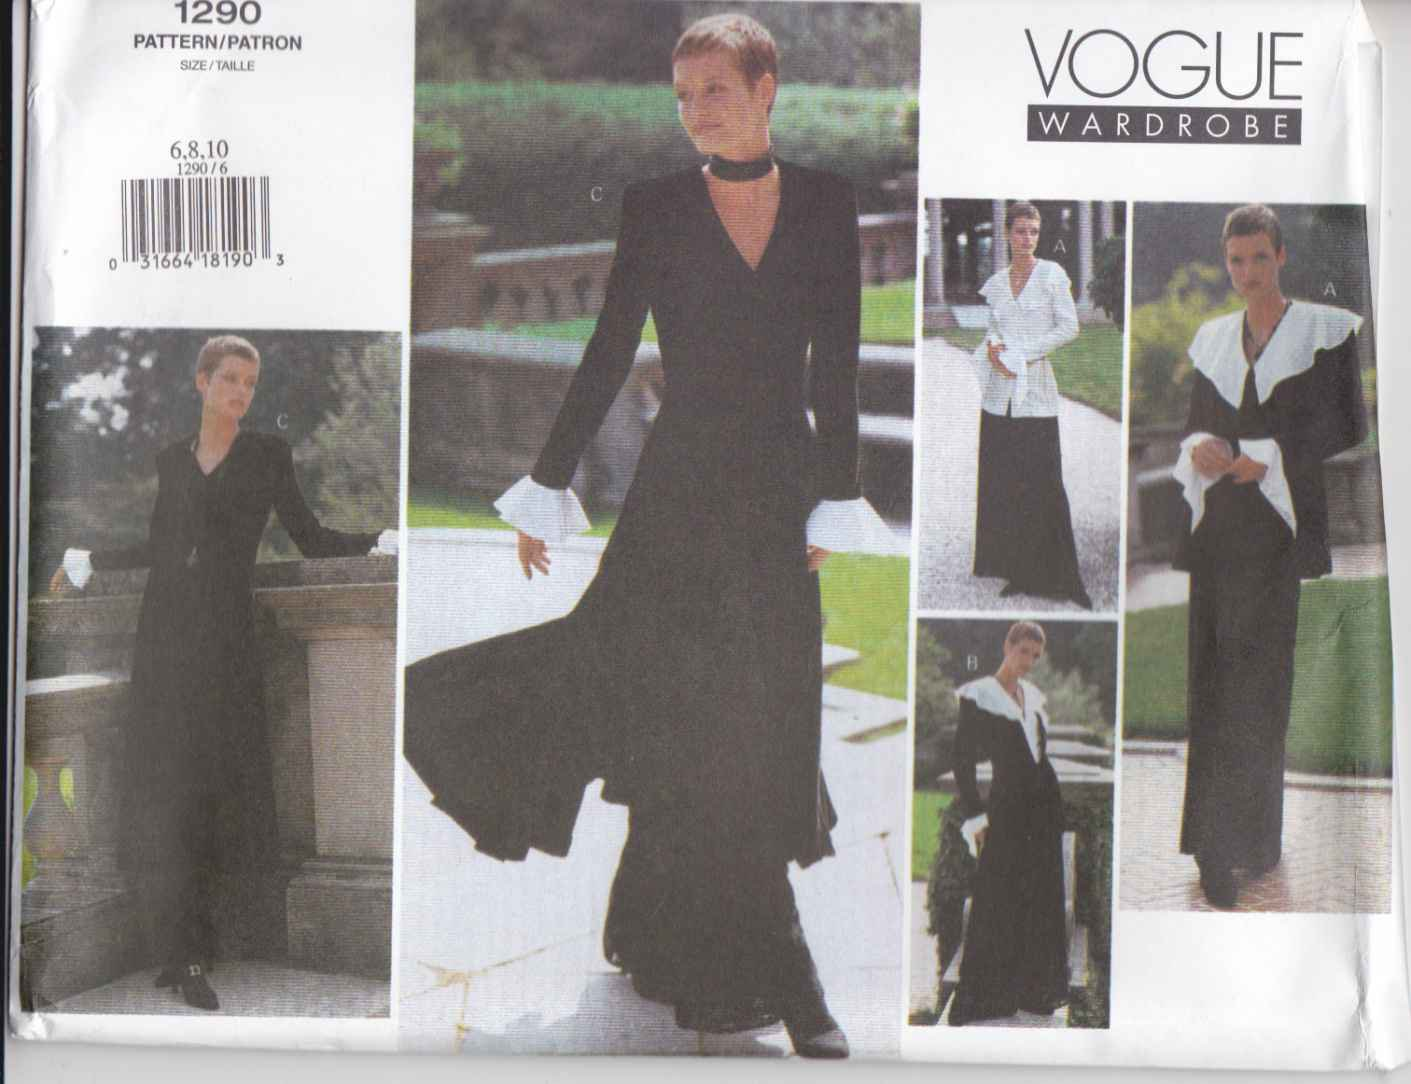 Vogue Sewing Pattern 1290 Misses Size 18-22 Easy Wardrobe Jacket Dress Top Pants